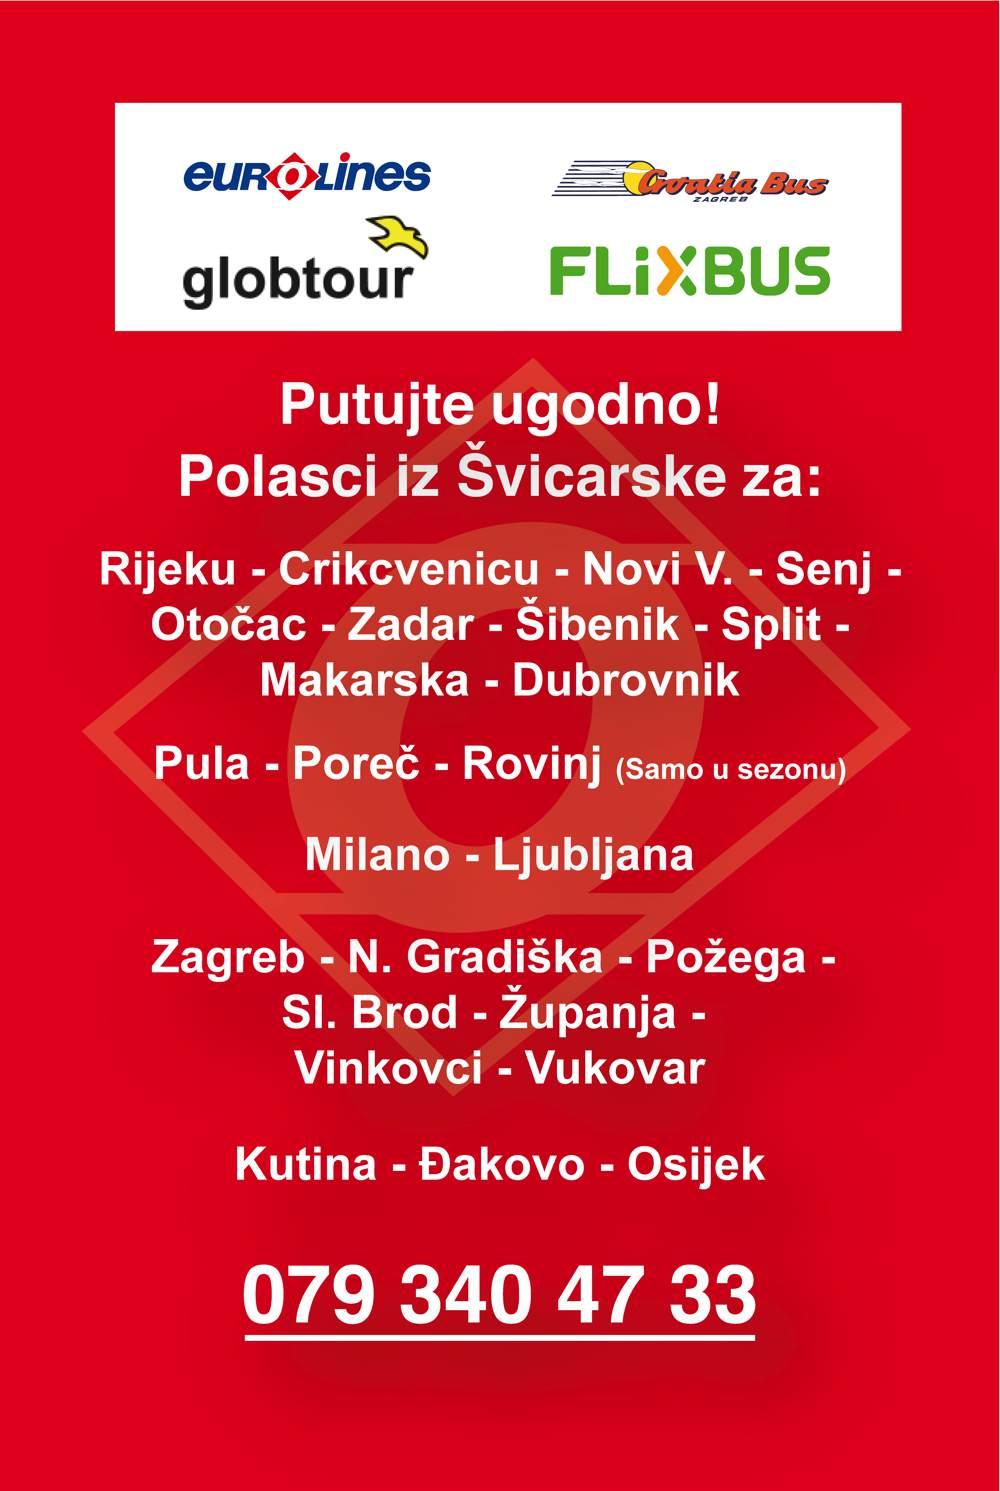 Eurolines, Croatia Bus, Flixbus, Globtour, eurolines24, Carreisen und Busreisen nach Kroatien, Rijeka, Crikcvenicu, Zadar, Sibenik, Split, Makarska, Ljubljana, Zagreb, Nova Gradiska, Vincovci